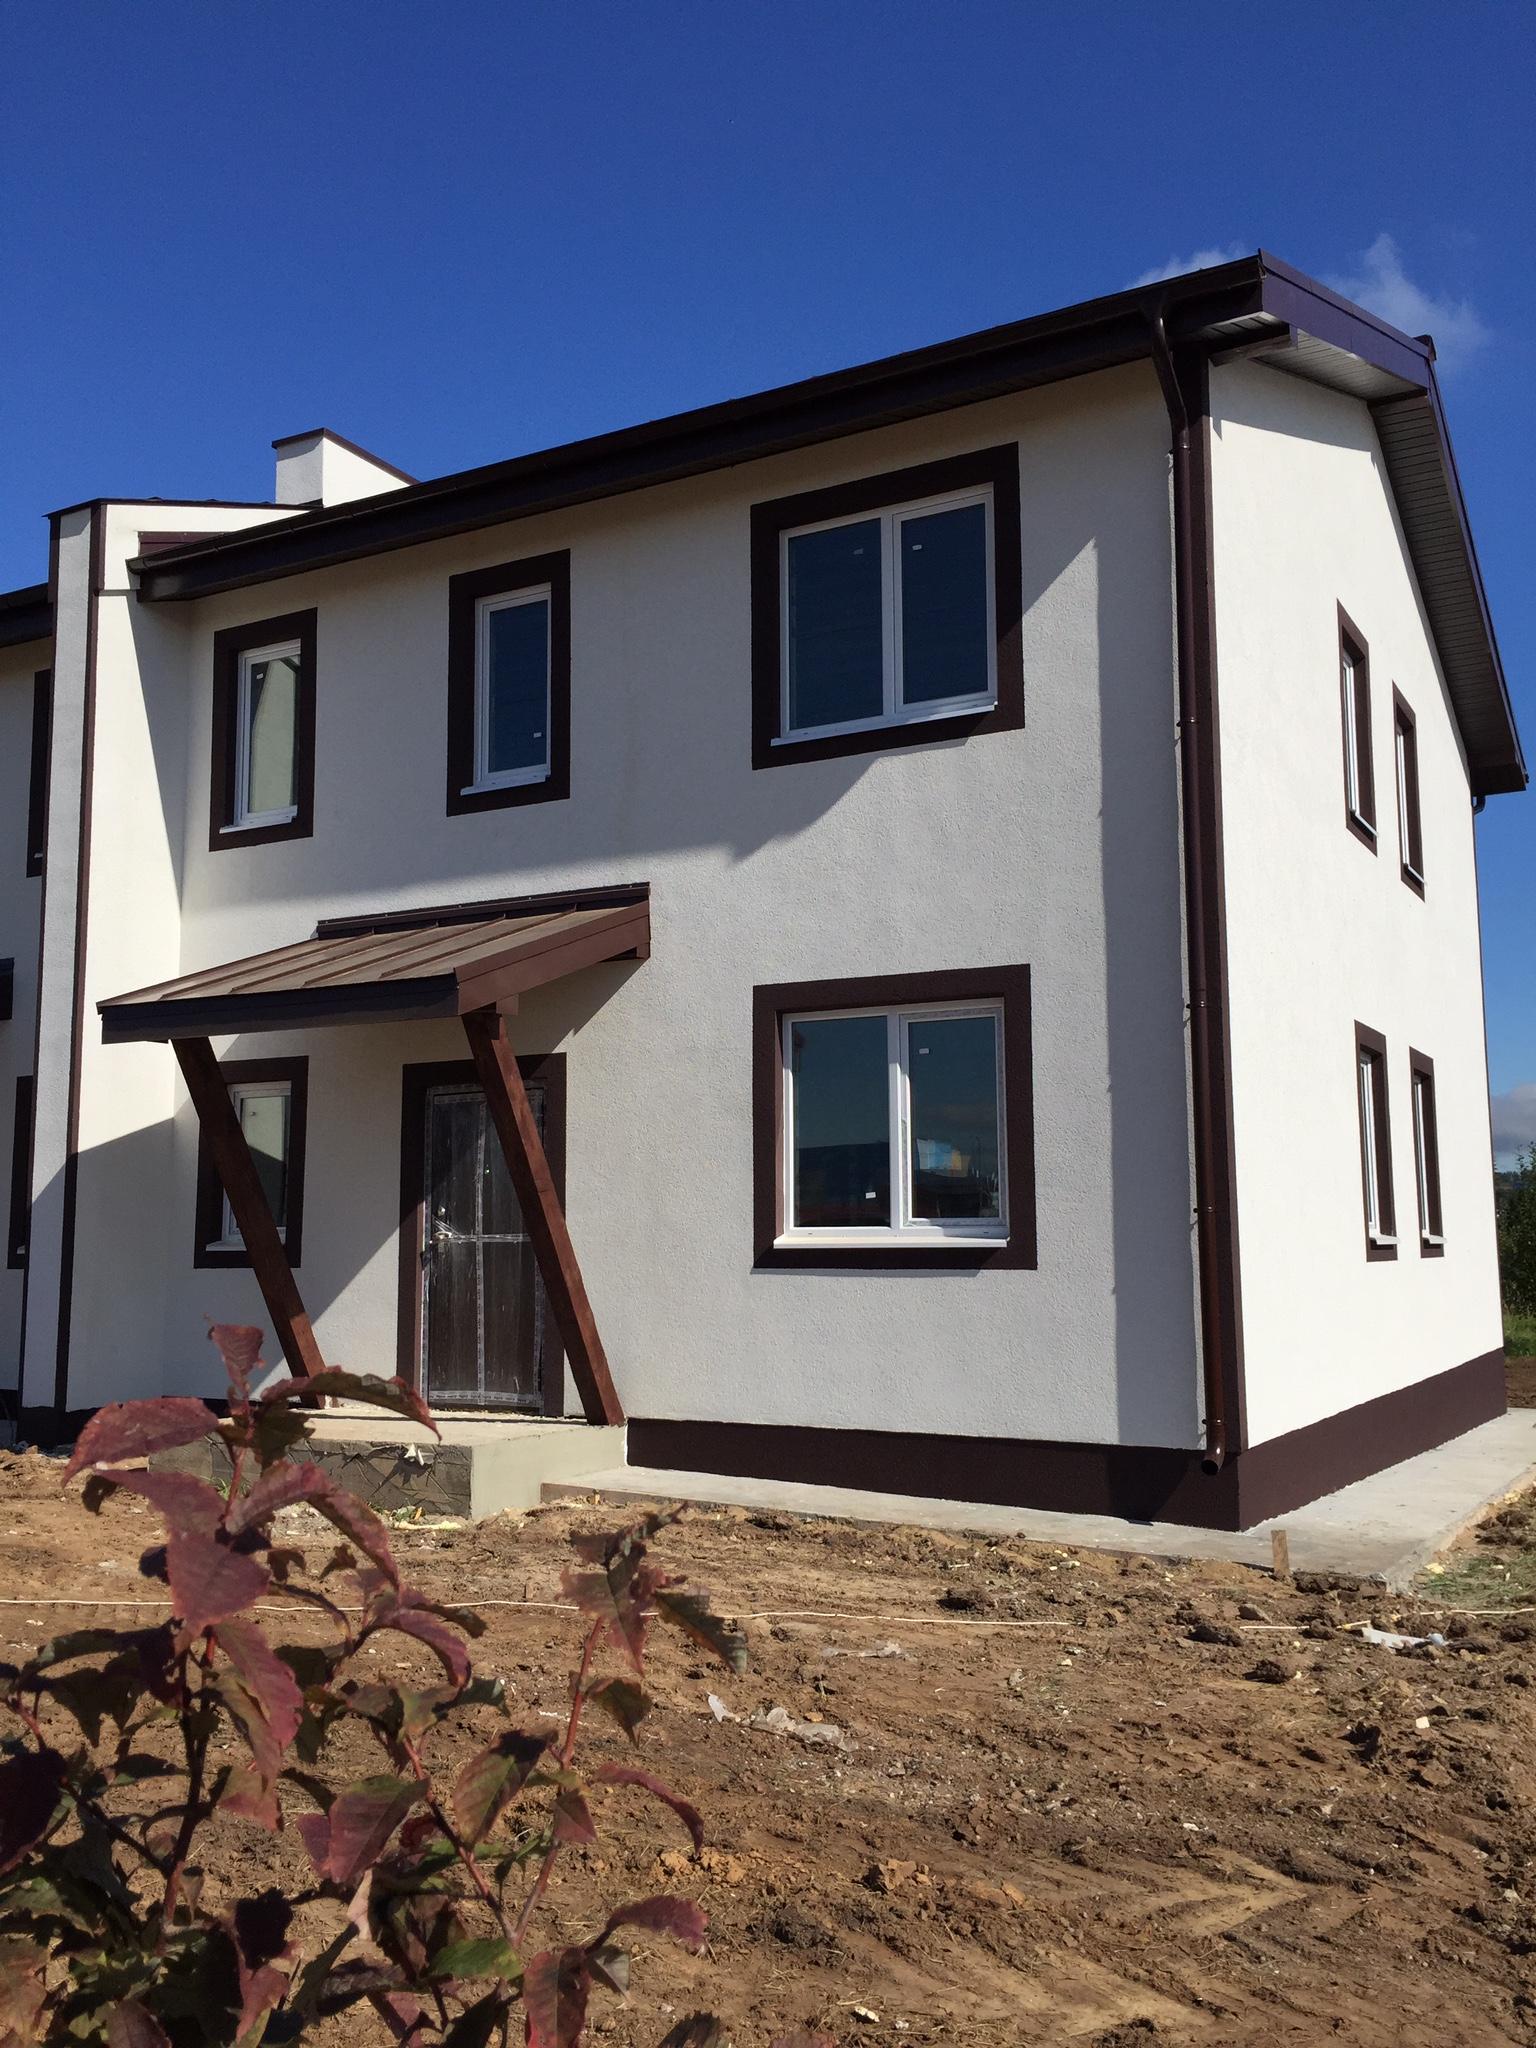 Продаю дом 130 м2 на участке 5 соток. тел. 8(910)8874887